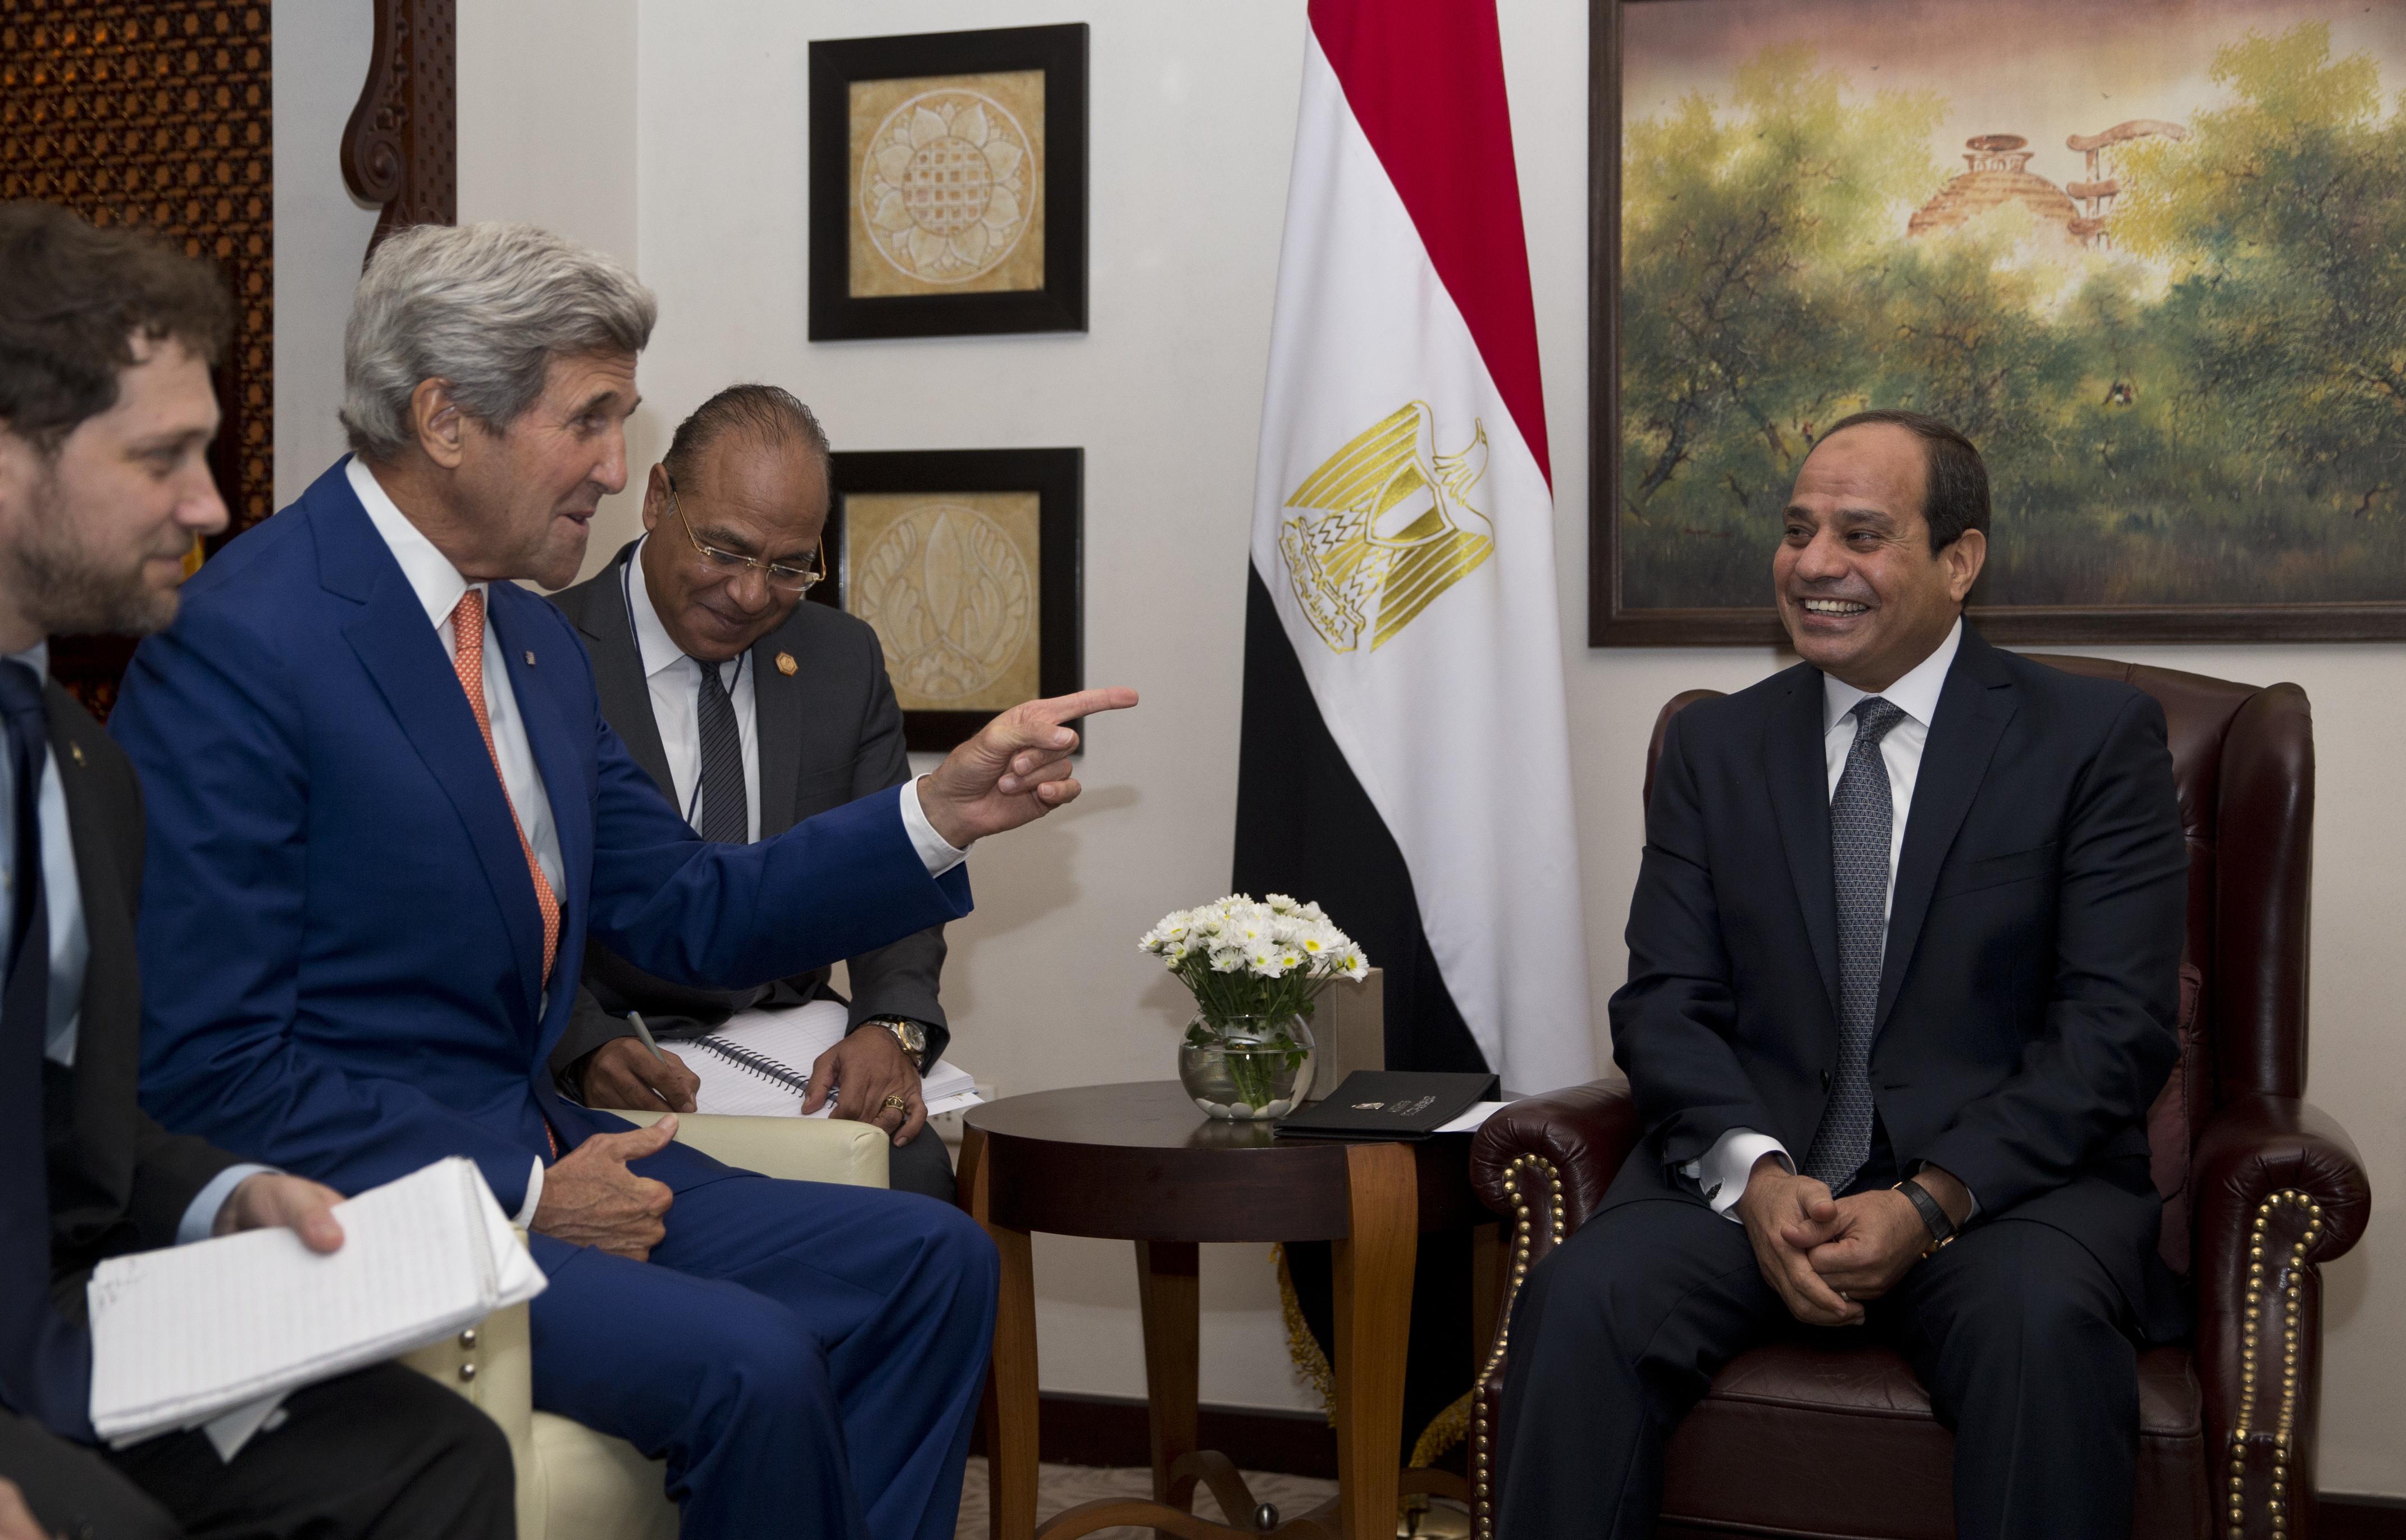 U.S. Secretary of State John Kerry, second left, meets Egyptian President Abdel Fattah El-Sisi, right, in New Delhi, India, Thursday, Sept. 1, 2016.